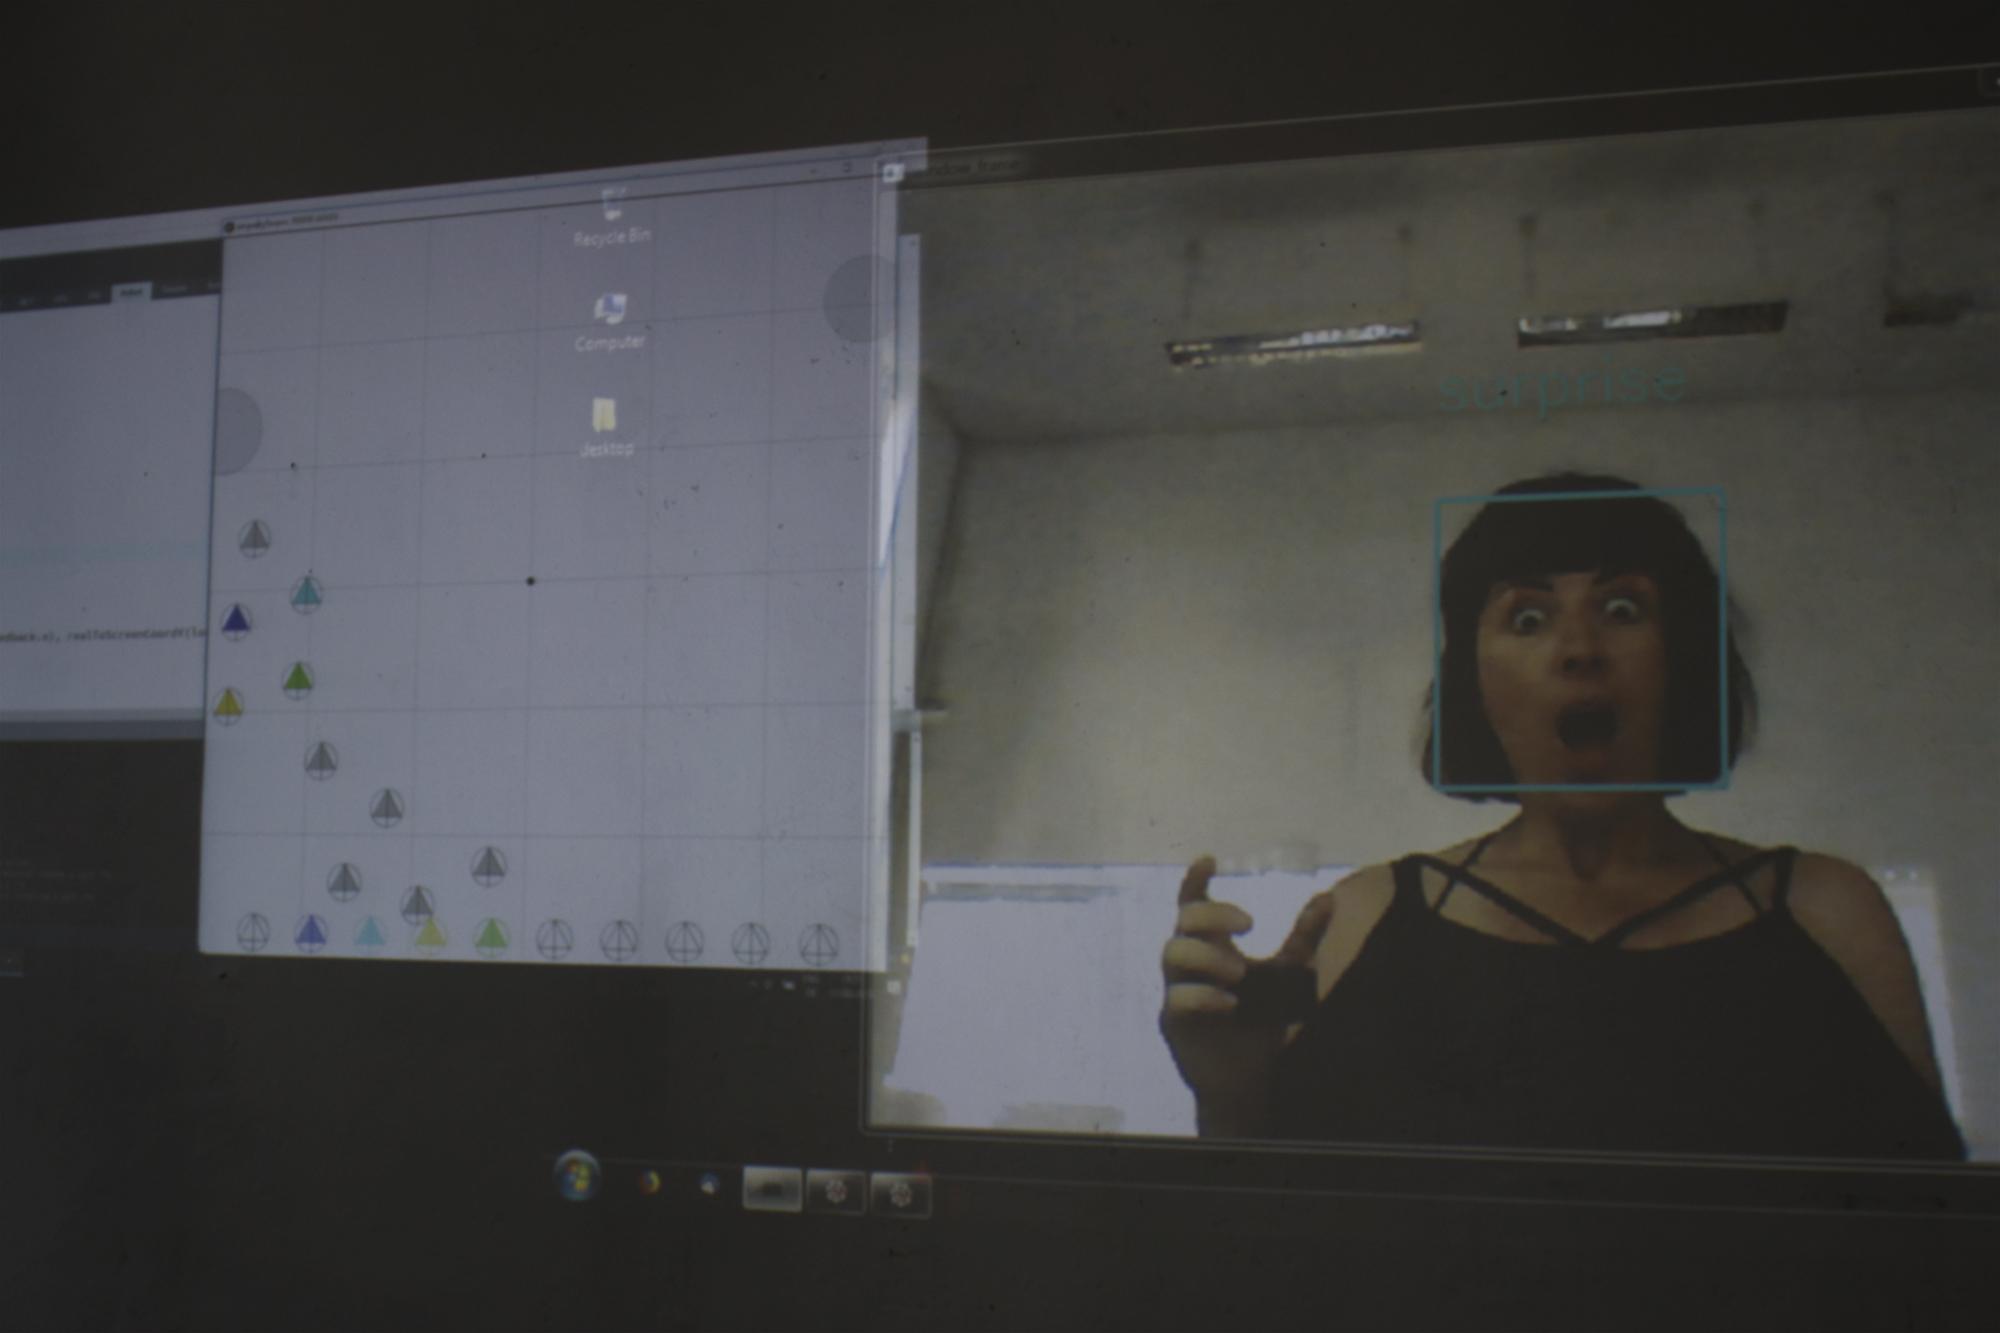 open_studio_empathy_swarm_robots_sm_0016_08